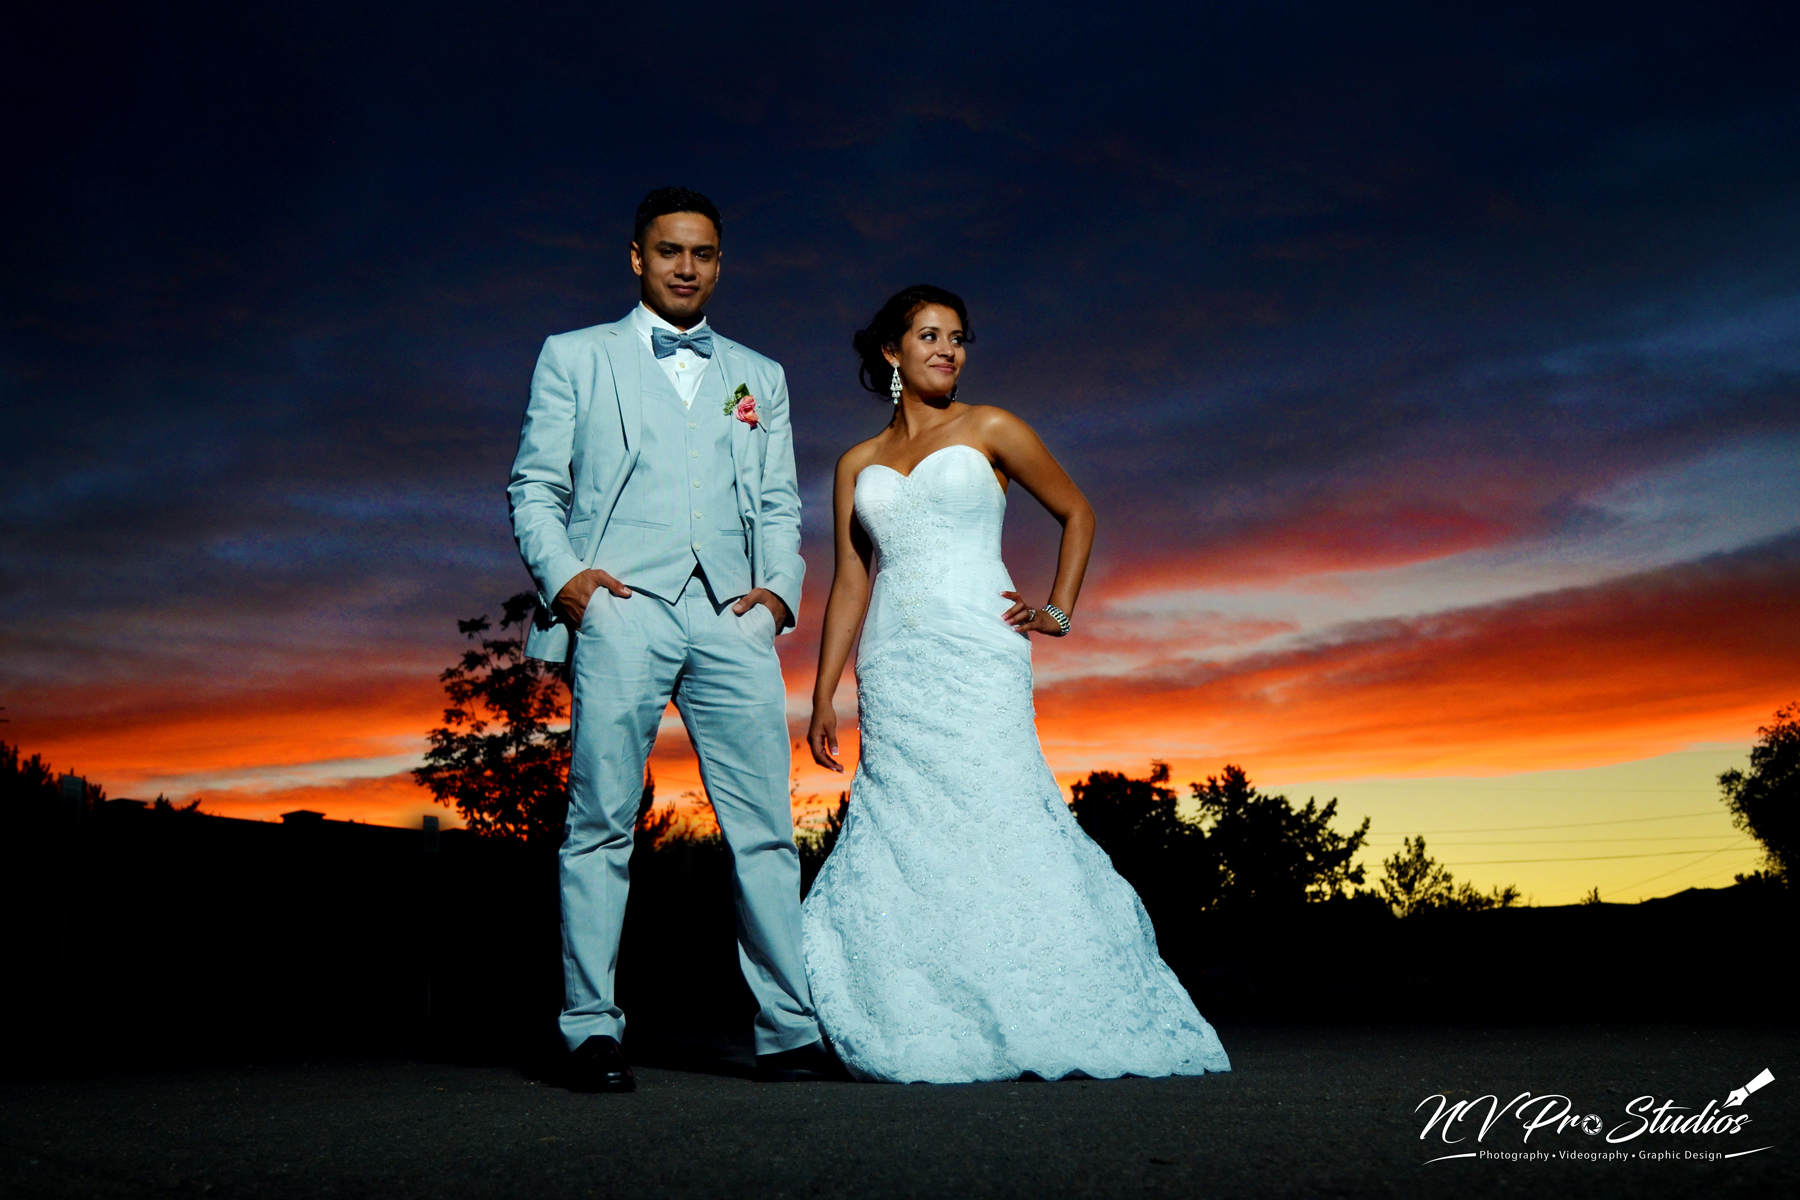 Carson City Photography | Wedding Photography